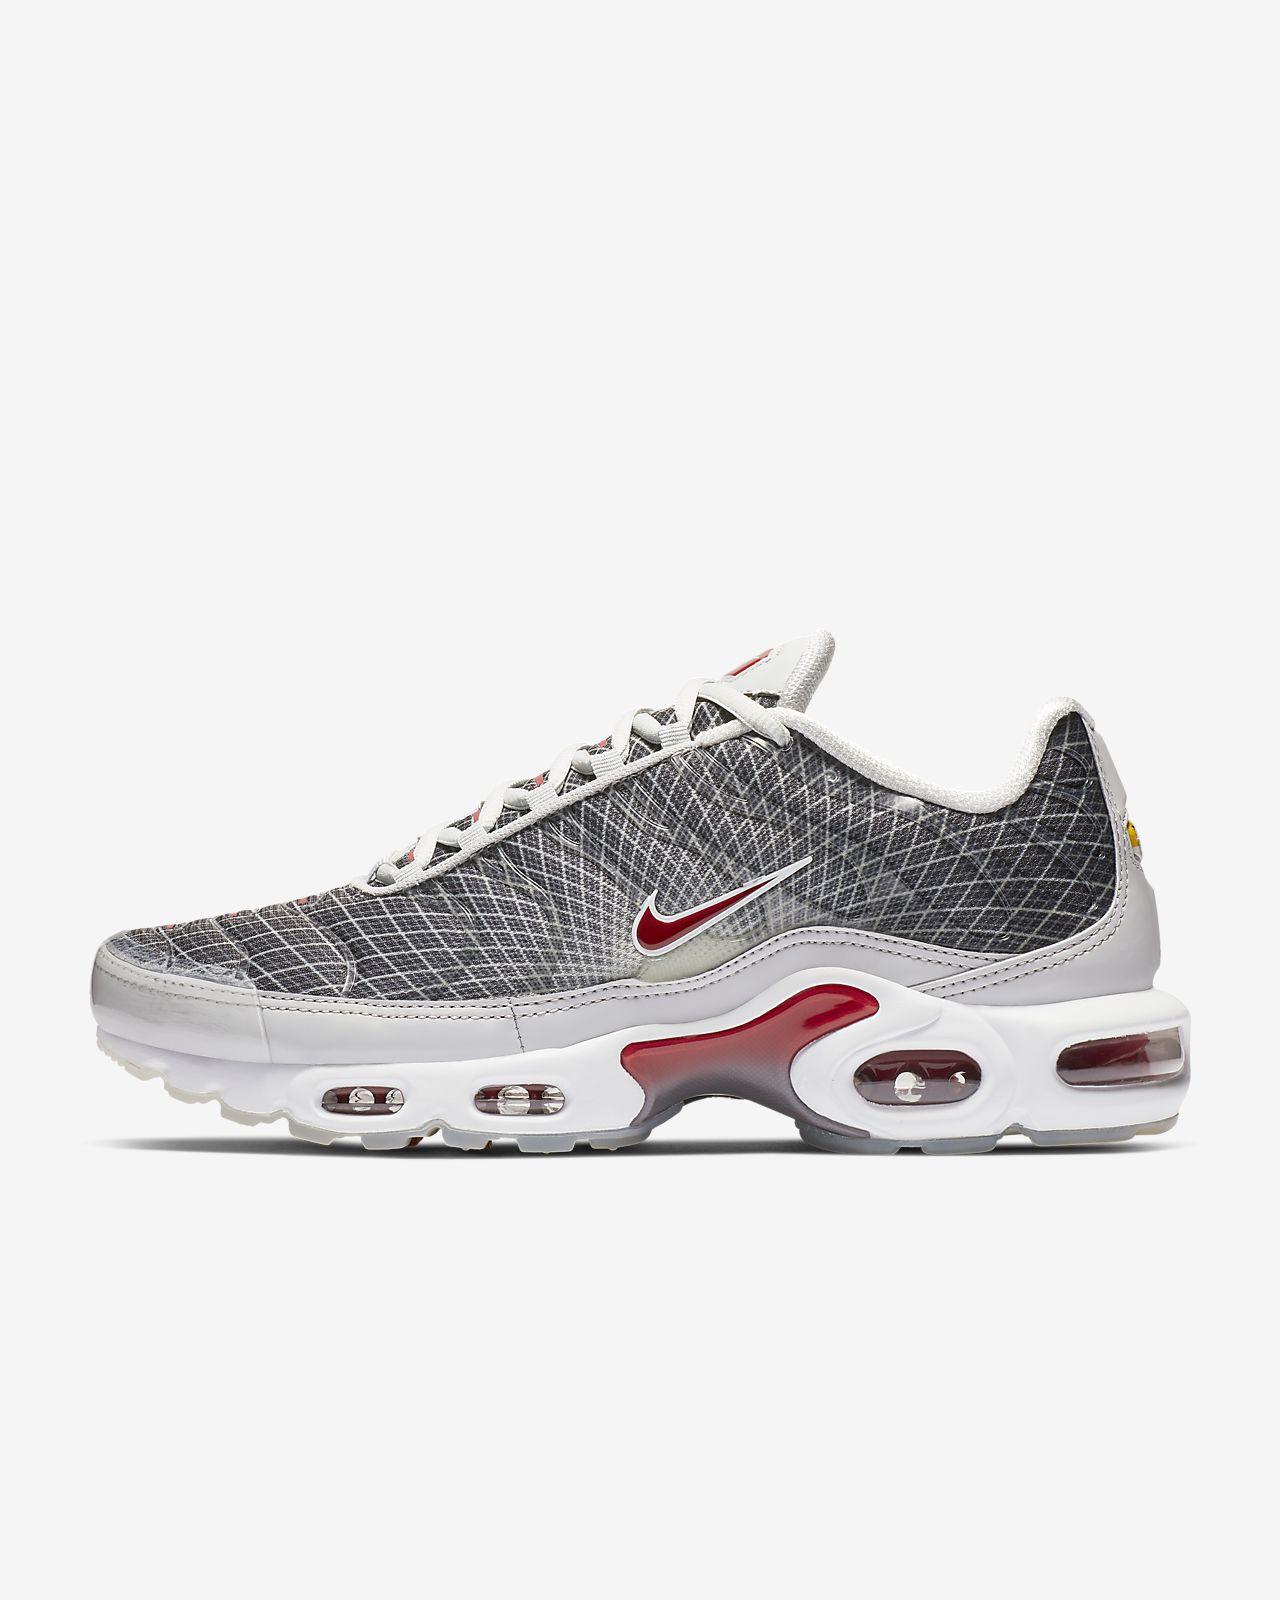 san francisco b0edc 0a241 ... Nike Air Max Plus OG Shoe